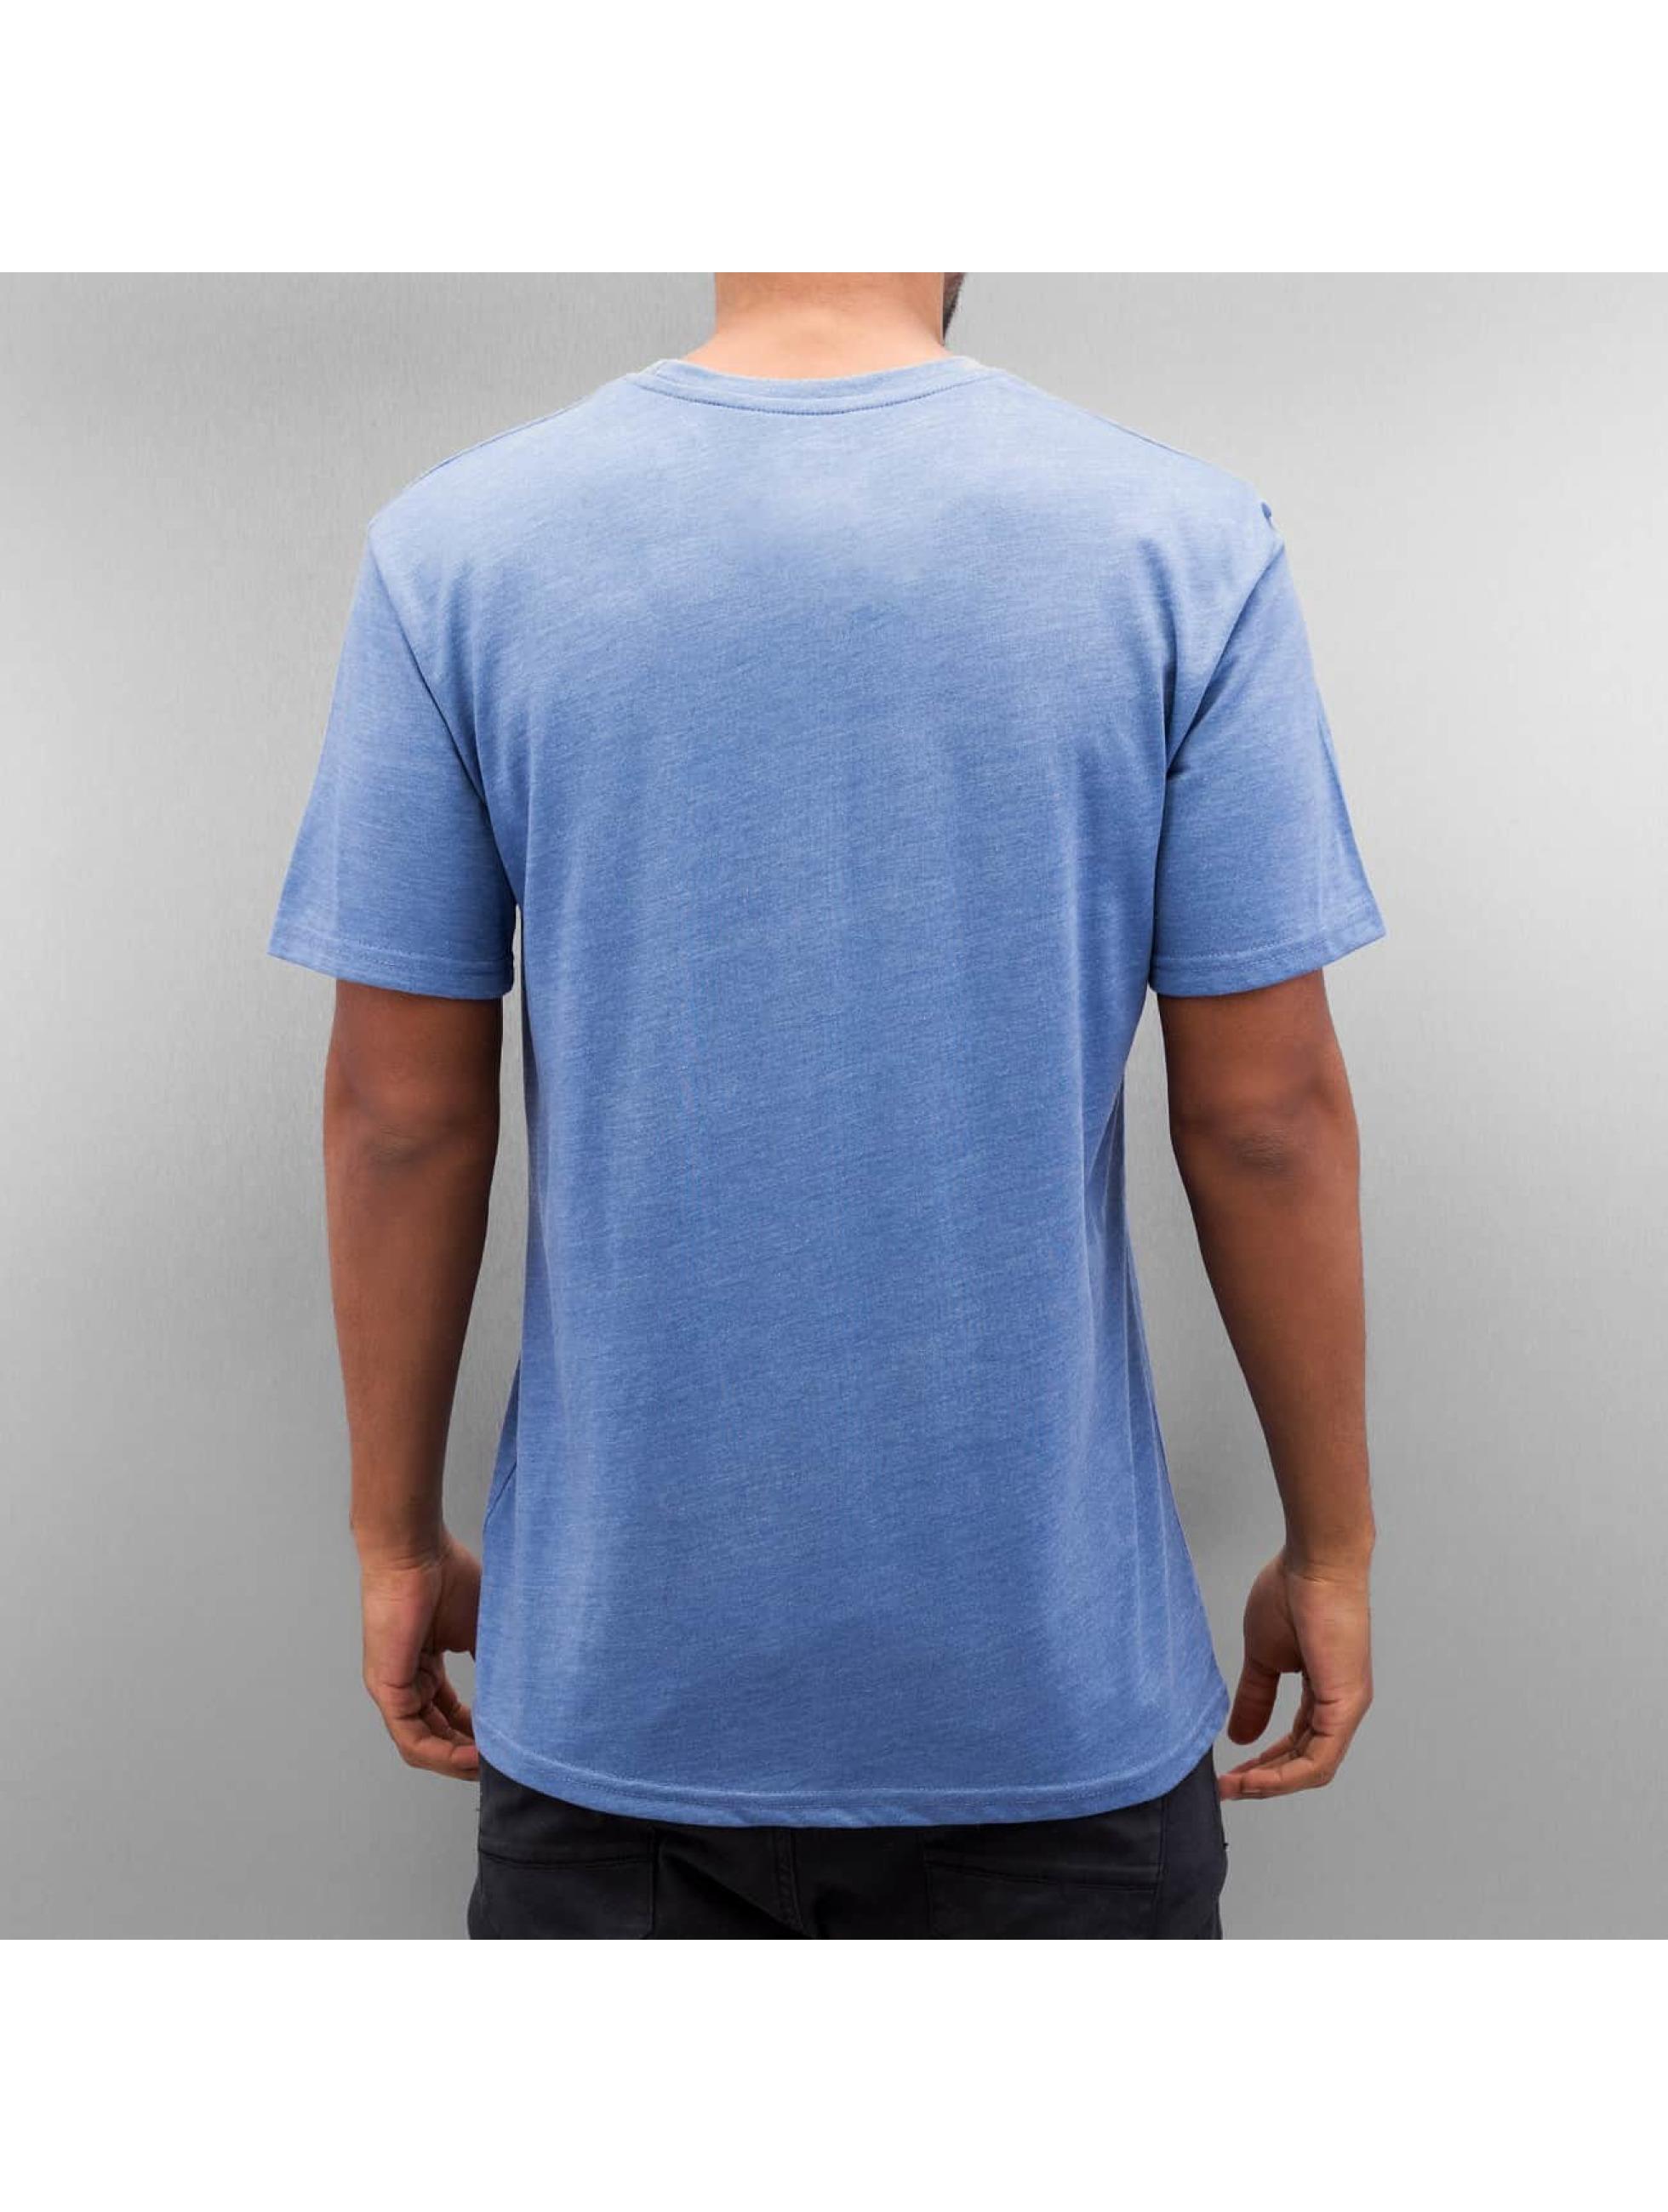 Cyprime T-paidat Breast Pocket sininen